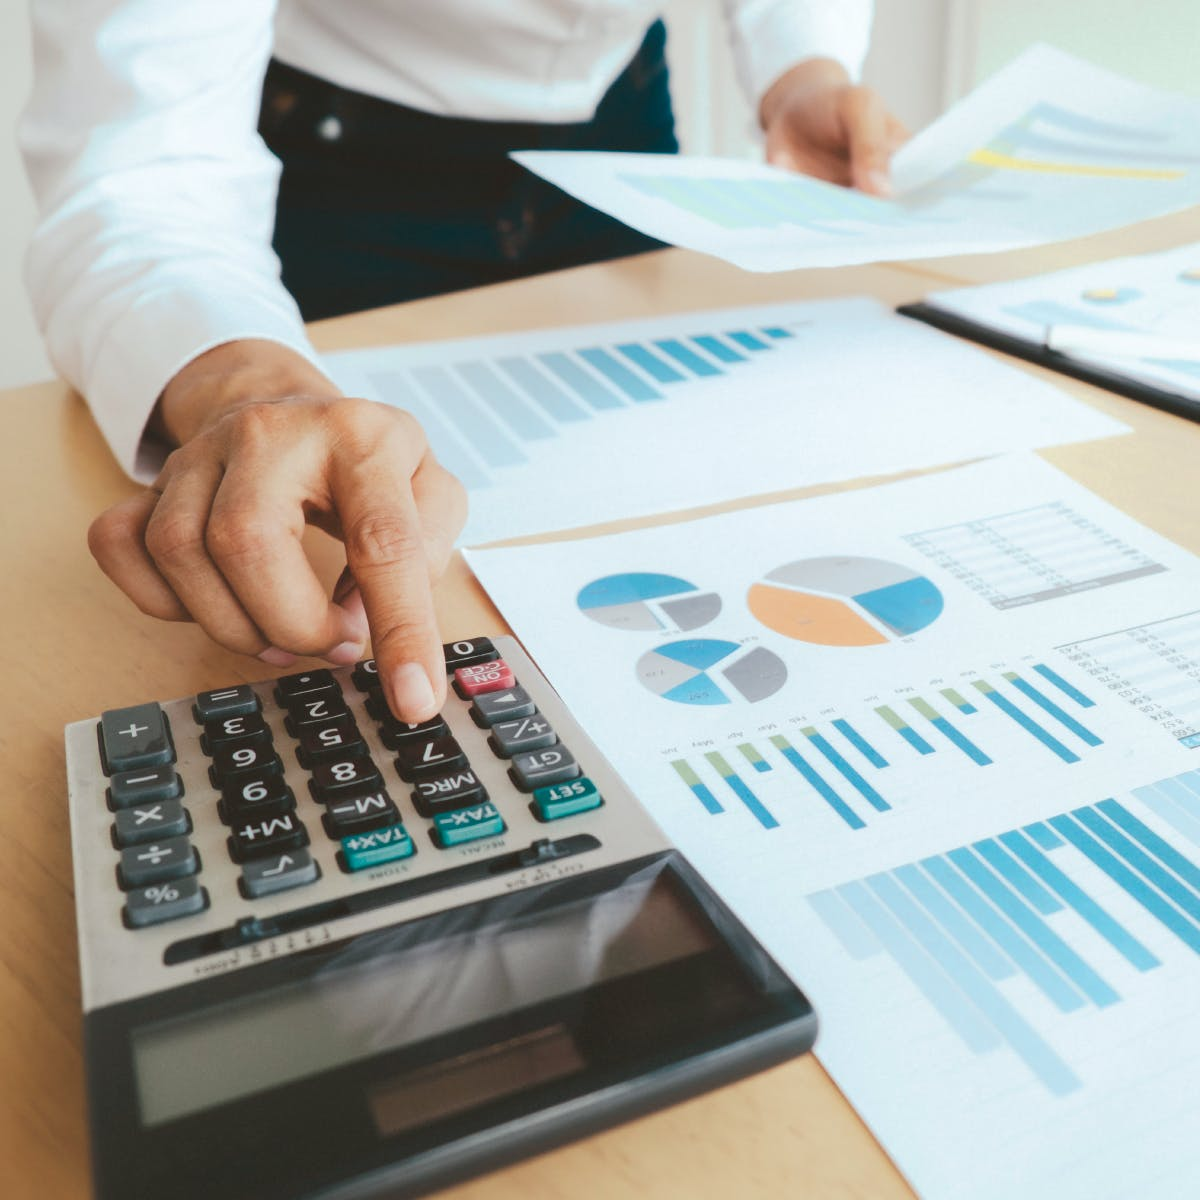 Budgeting essentials and development